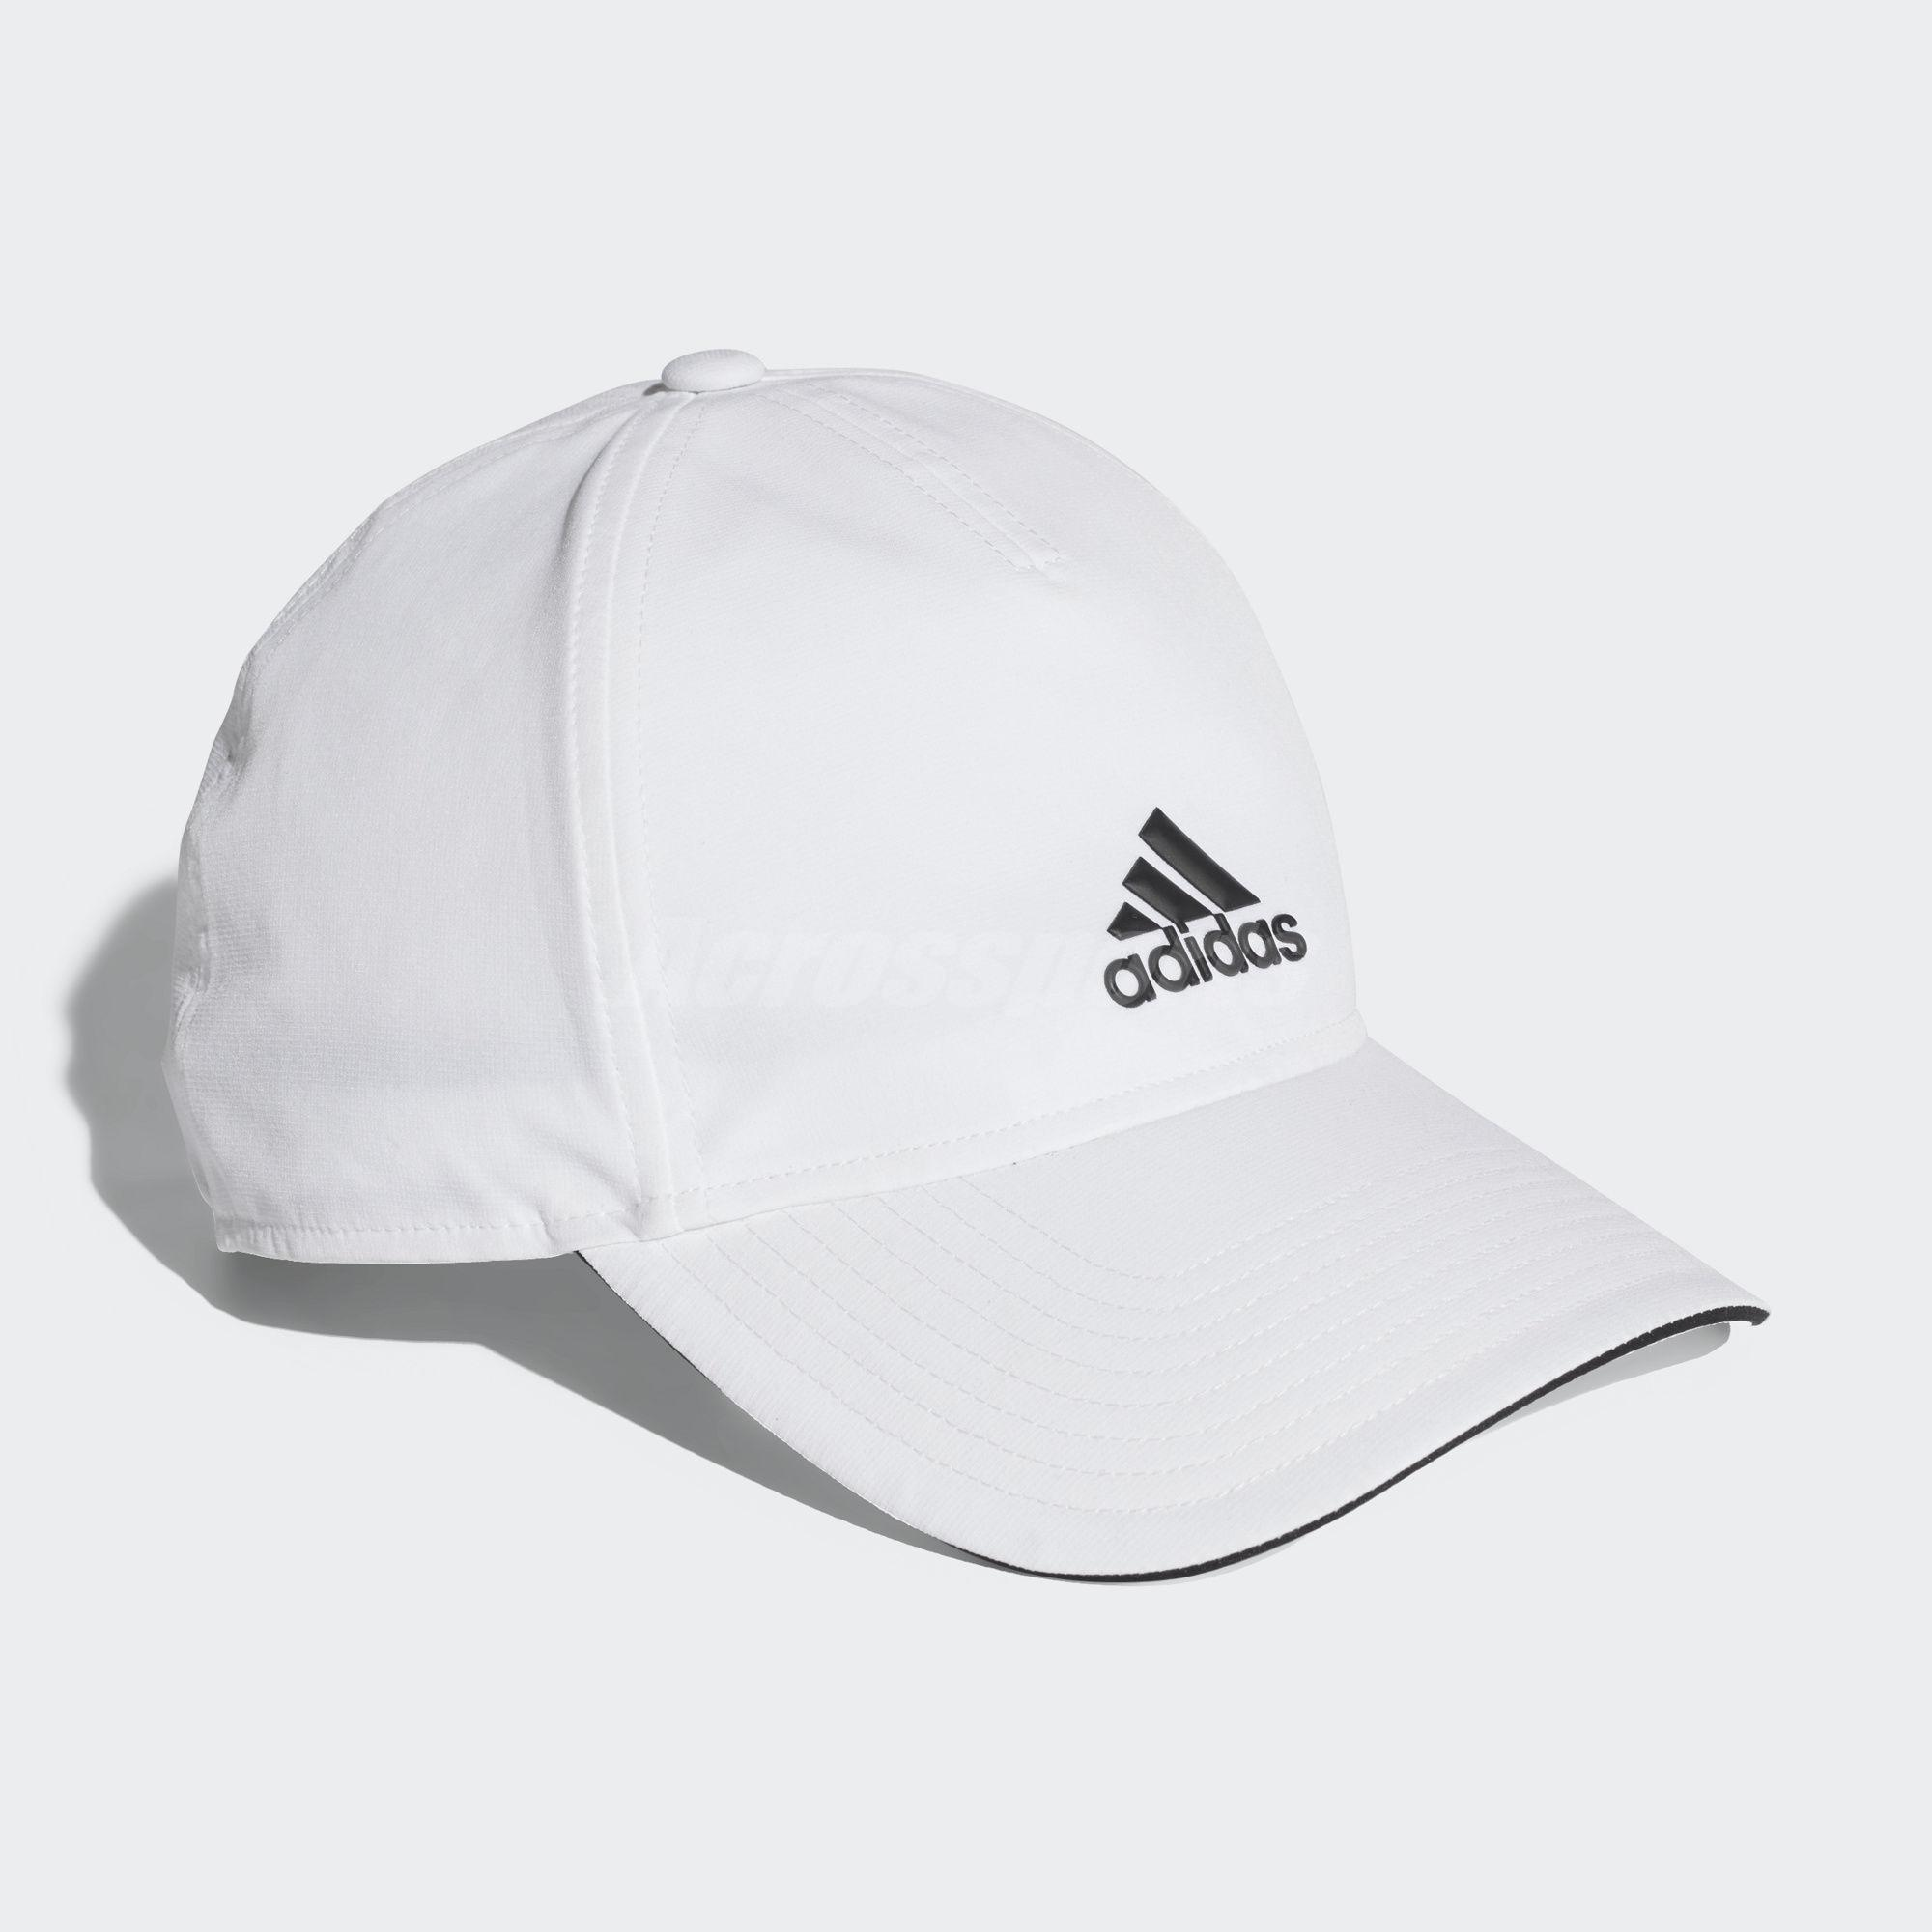 9450ca7aba4 adidas Unisex C40 5 Panels Climalite Cap White Black Sport Baseball ...